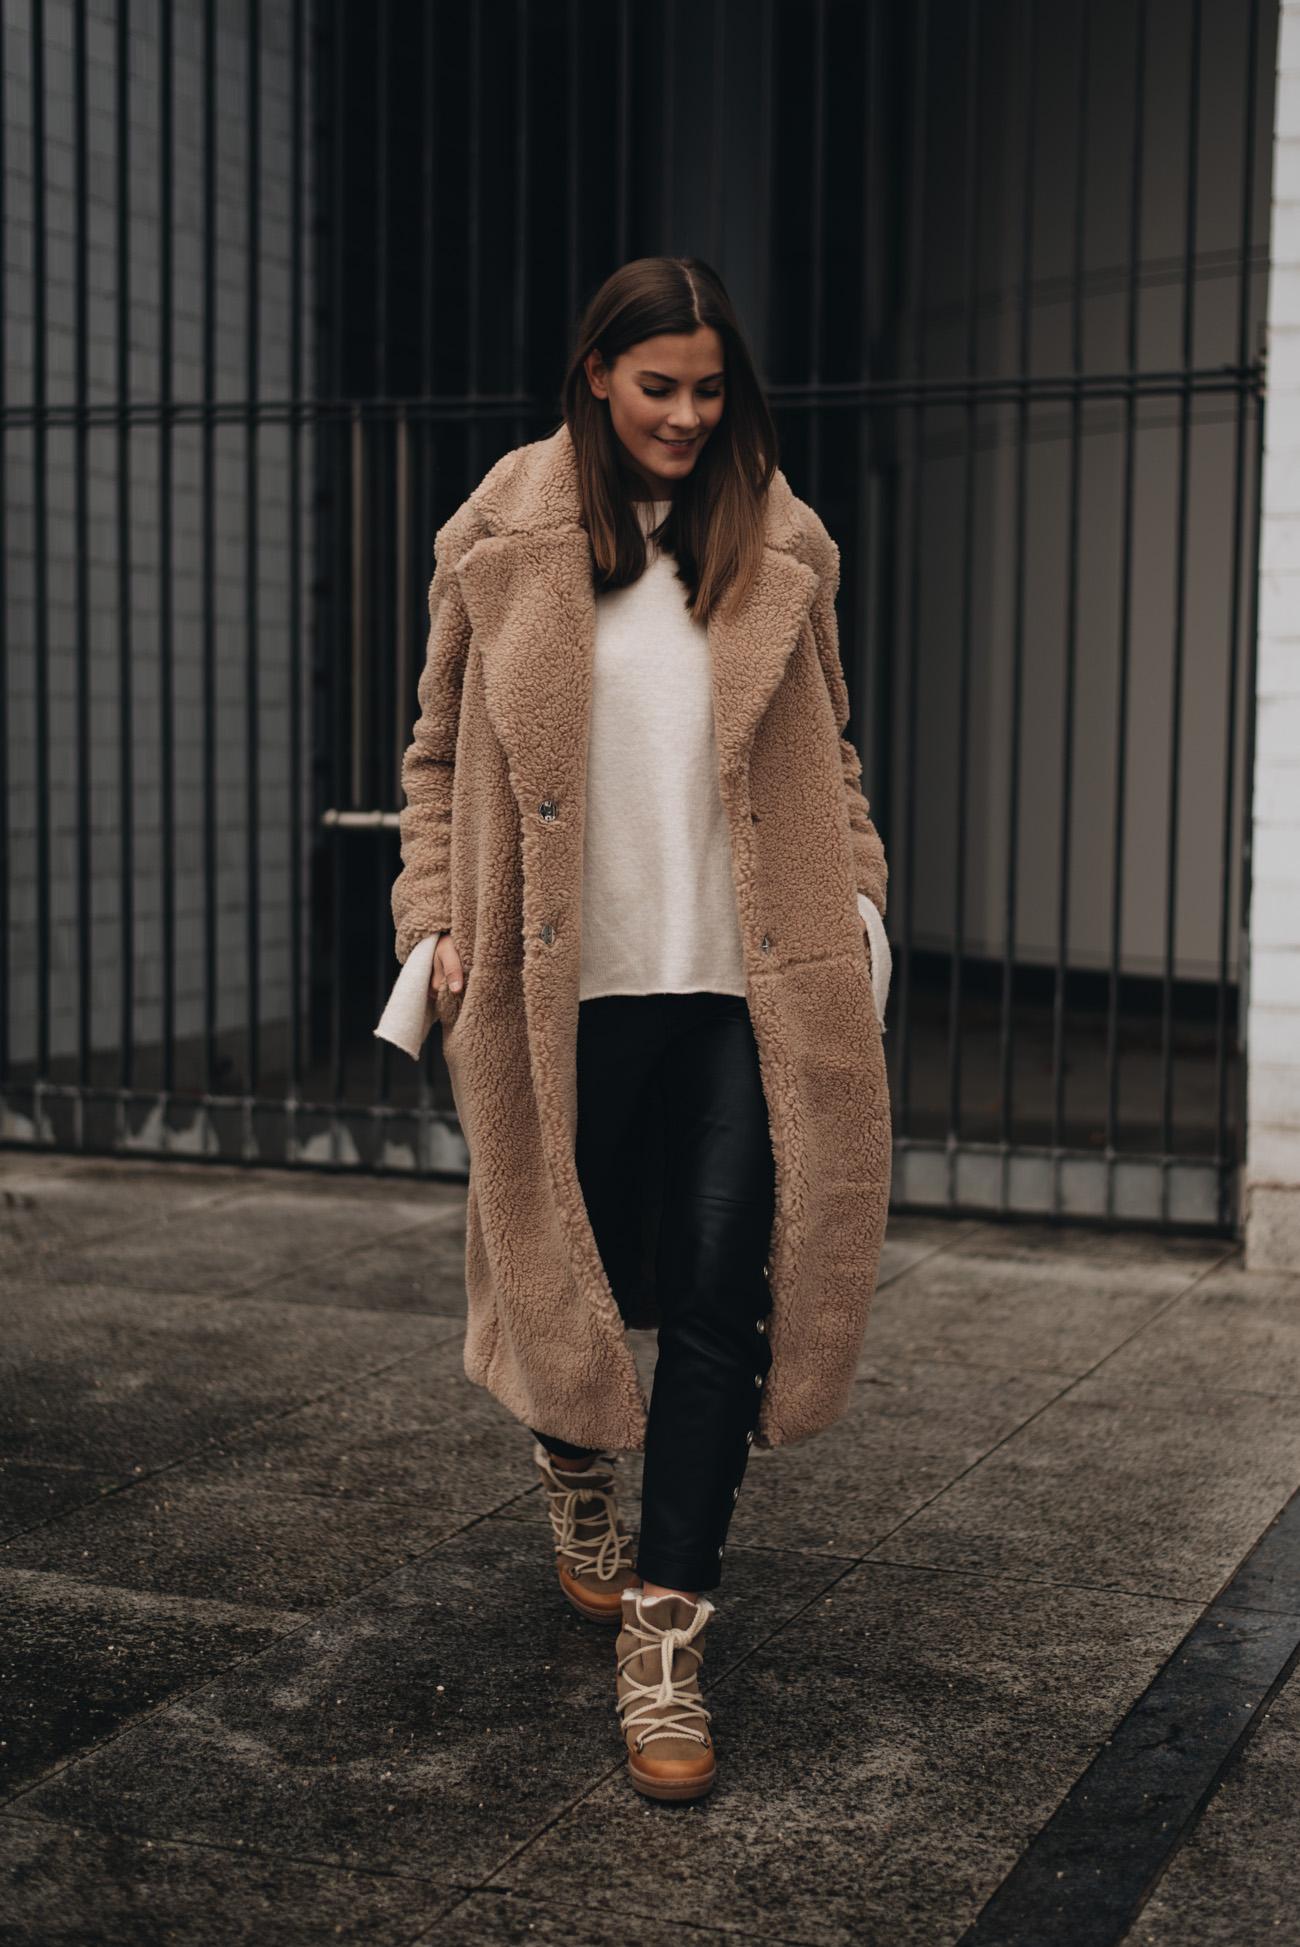 mantel-jacken-trends-winter-2017-teddy-coat-mantel